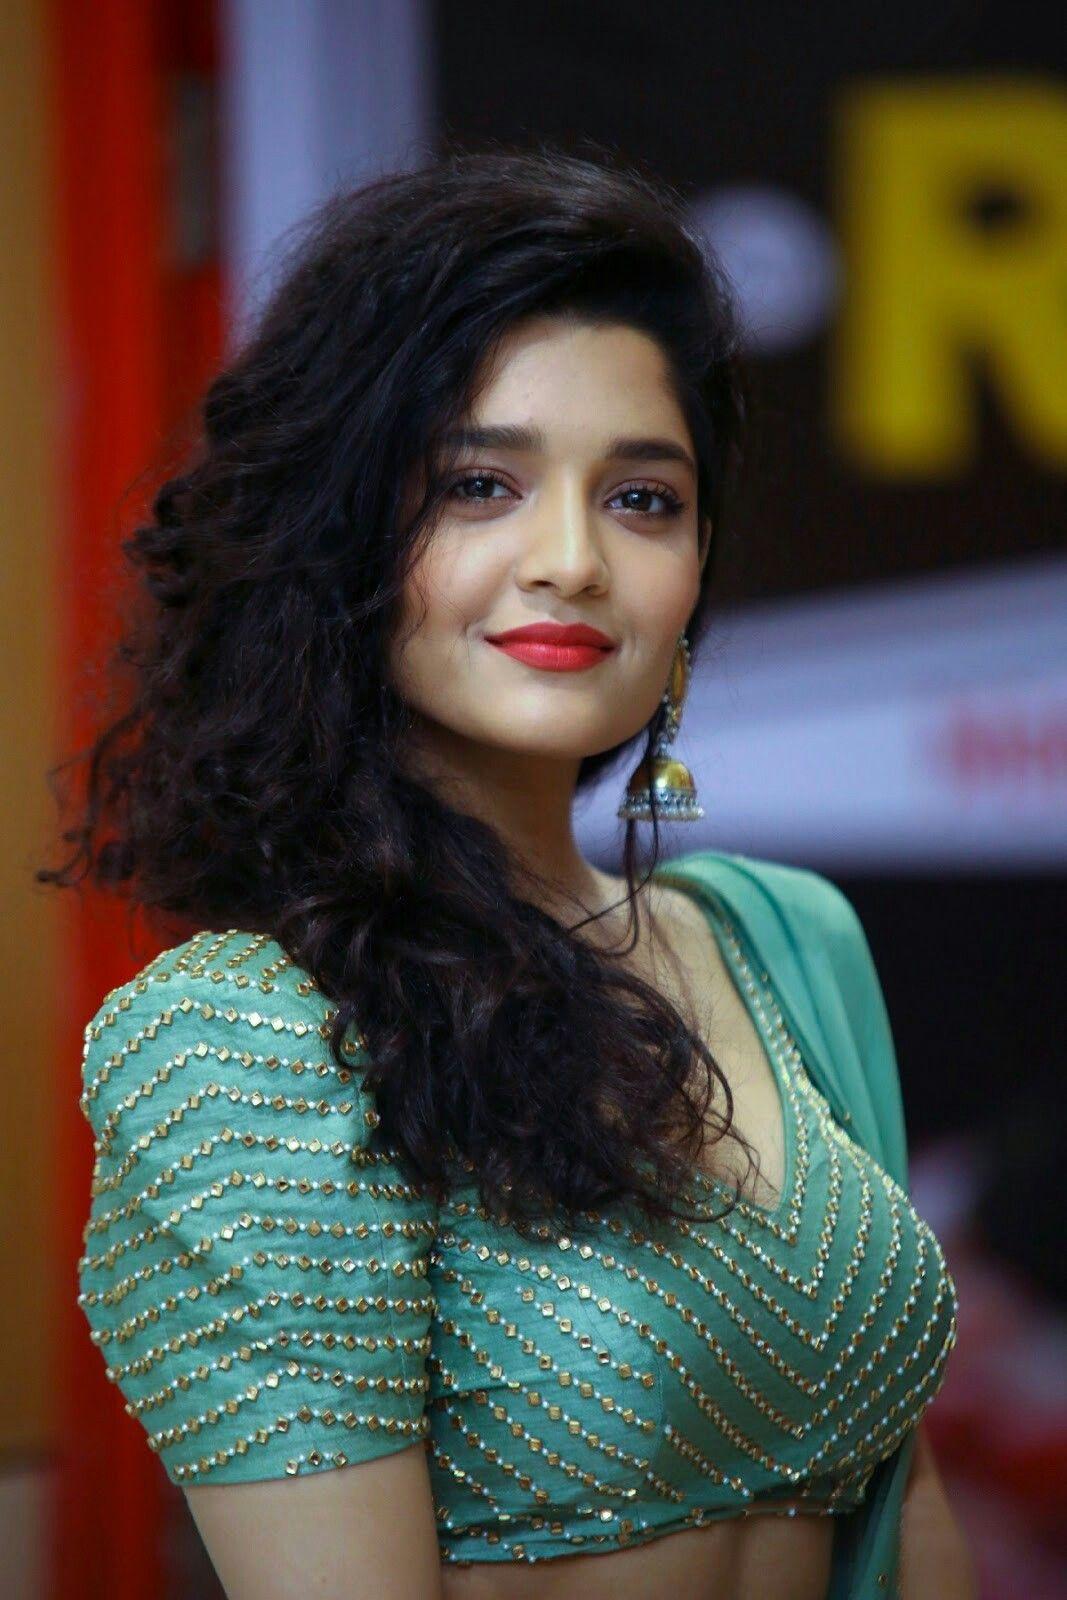 Indian beautiful girl photo-4564